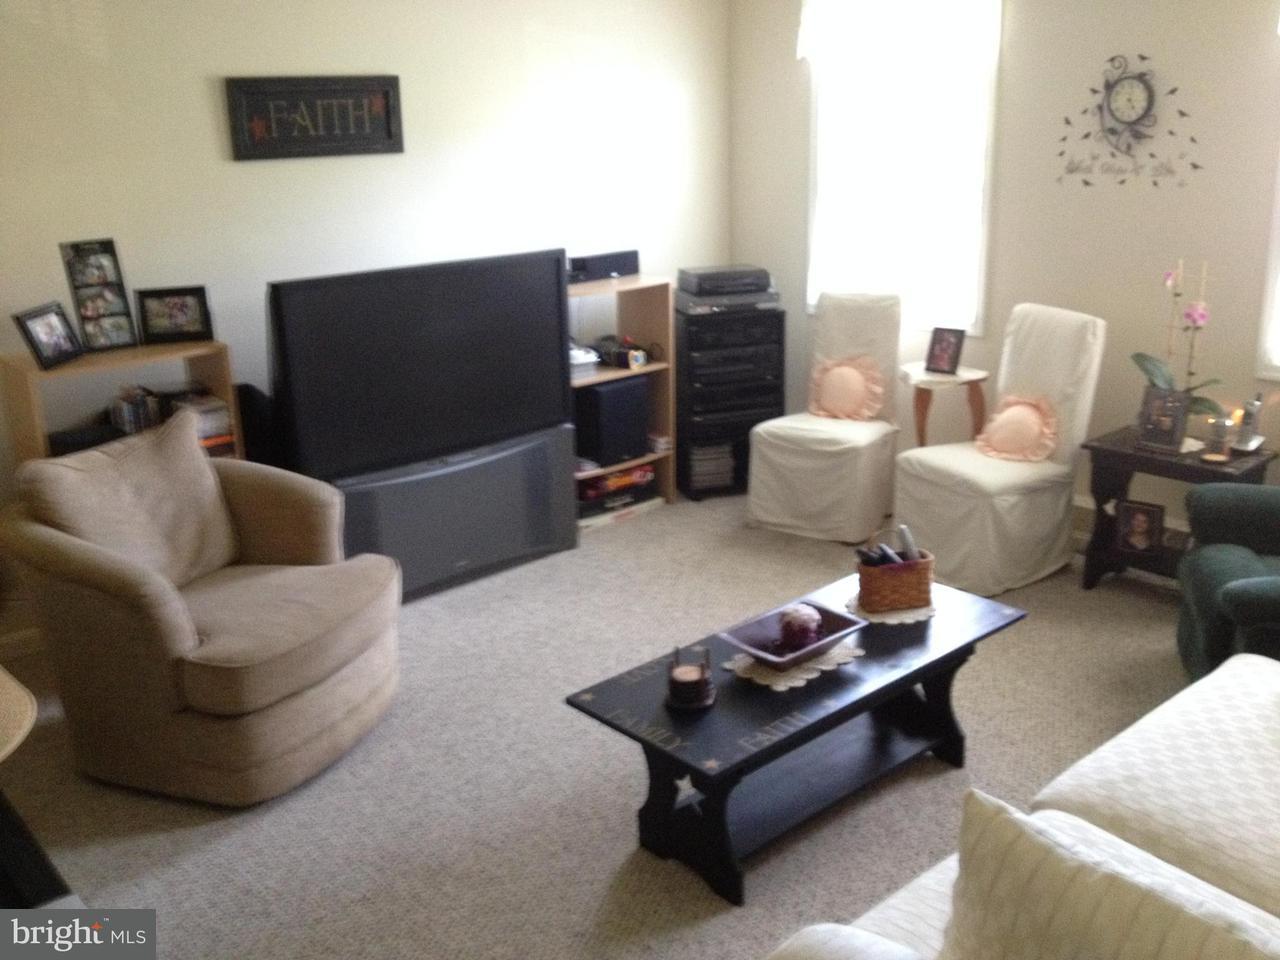 Other Residential for Rent at 13171 Seneca Dr Waynesboro, Pennsylvania 17268 United States